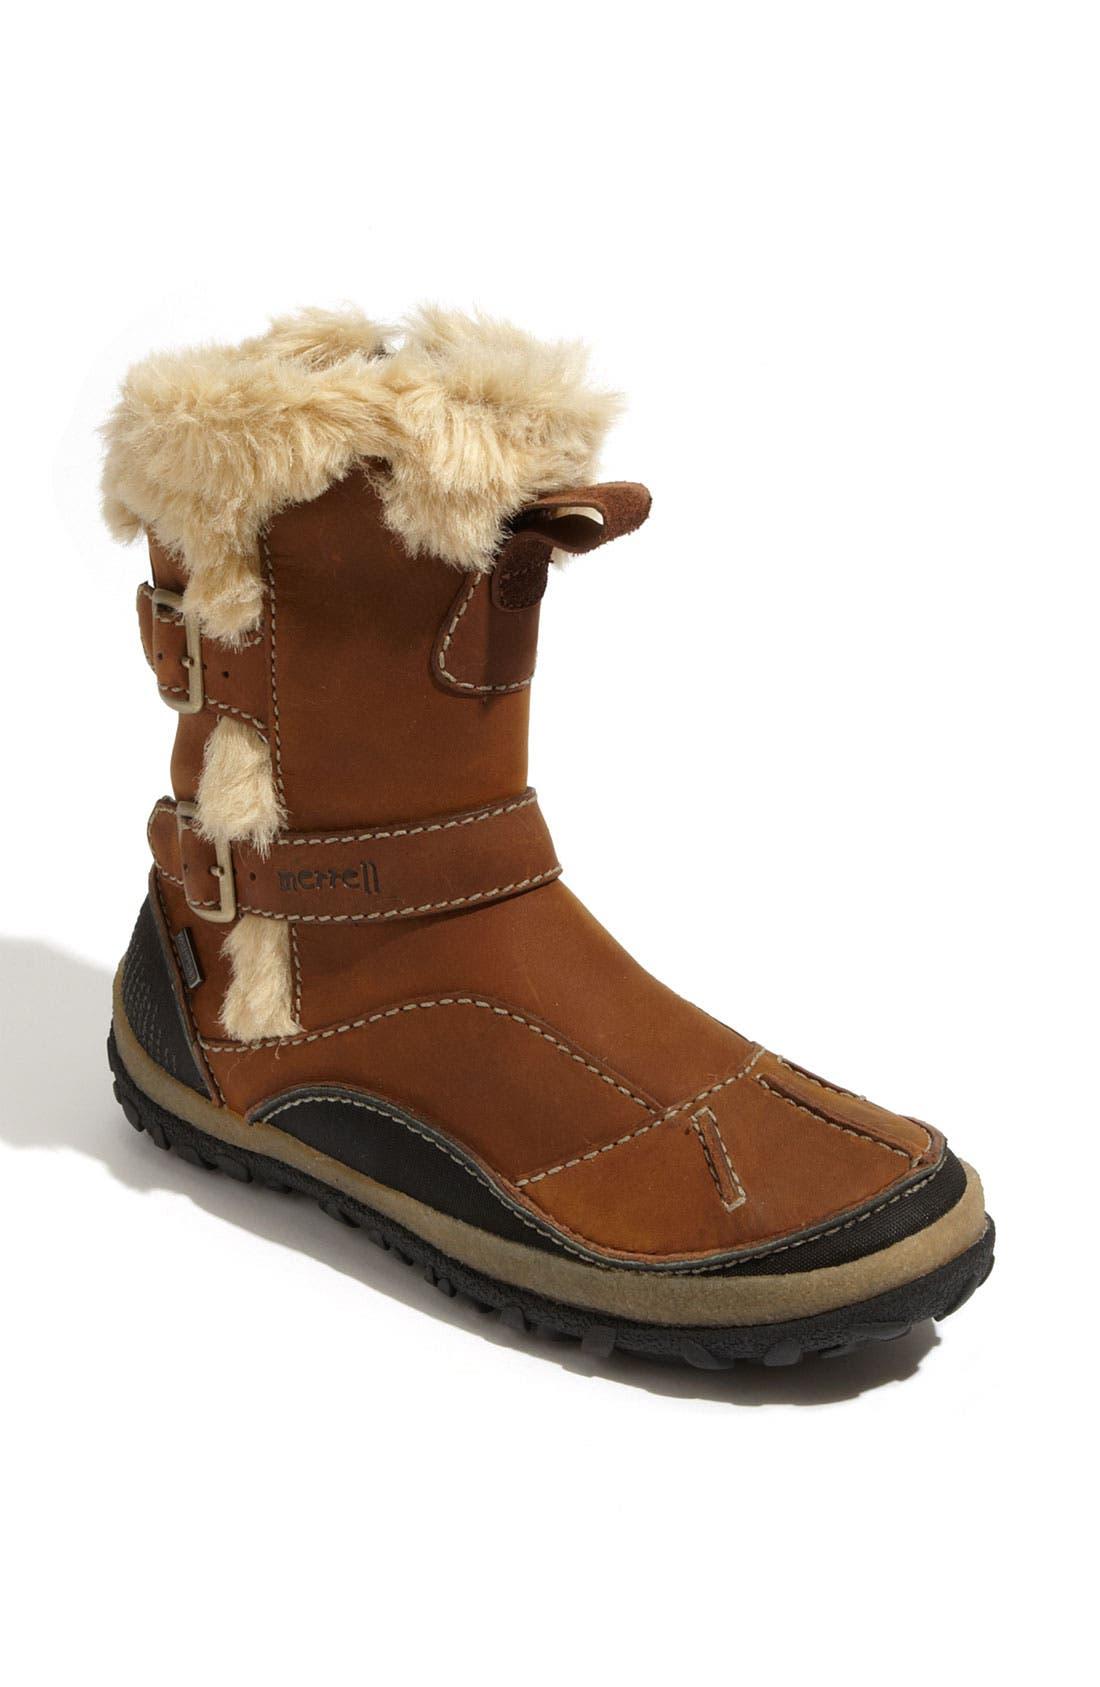 Main Image - Merrell 'Taiga' Buckle Boot